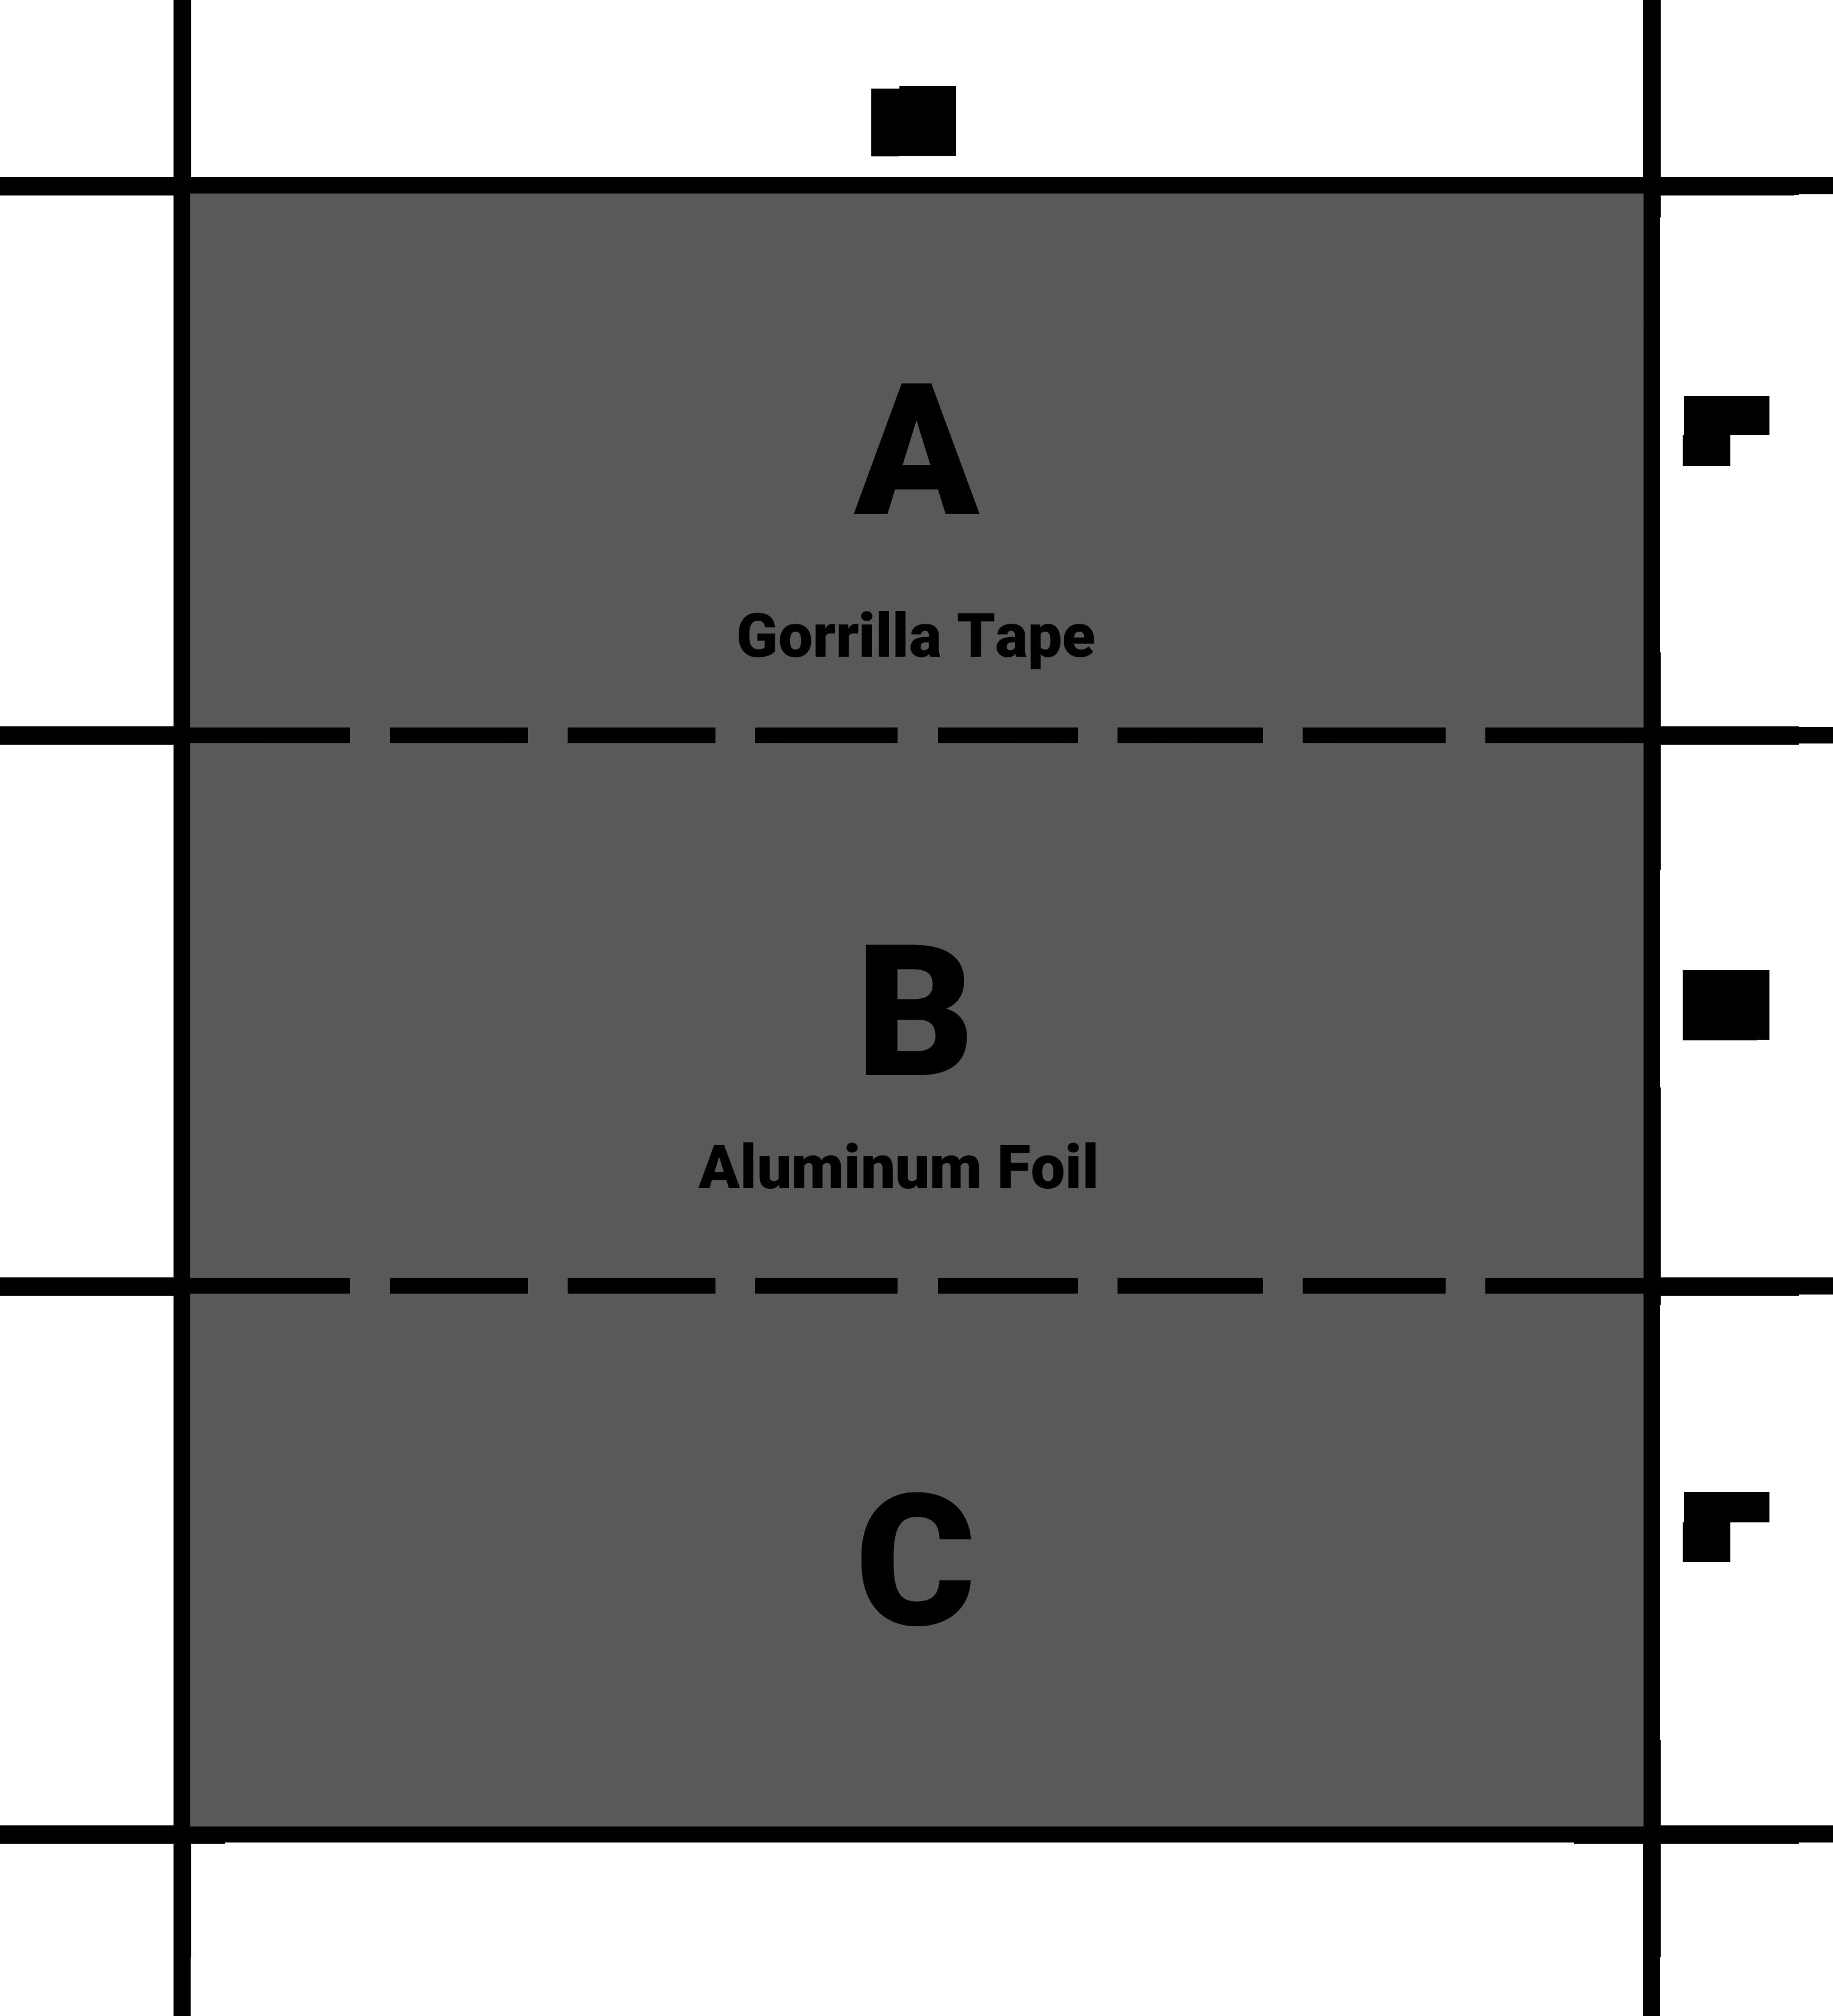 Diagrams Extrainfo Diagrams 30009wranglerjeep1wirejbs